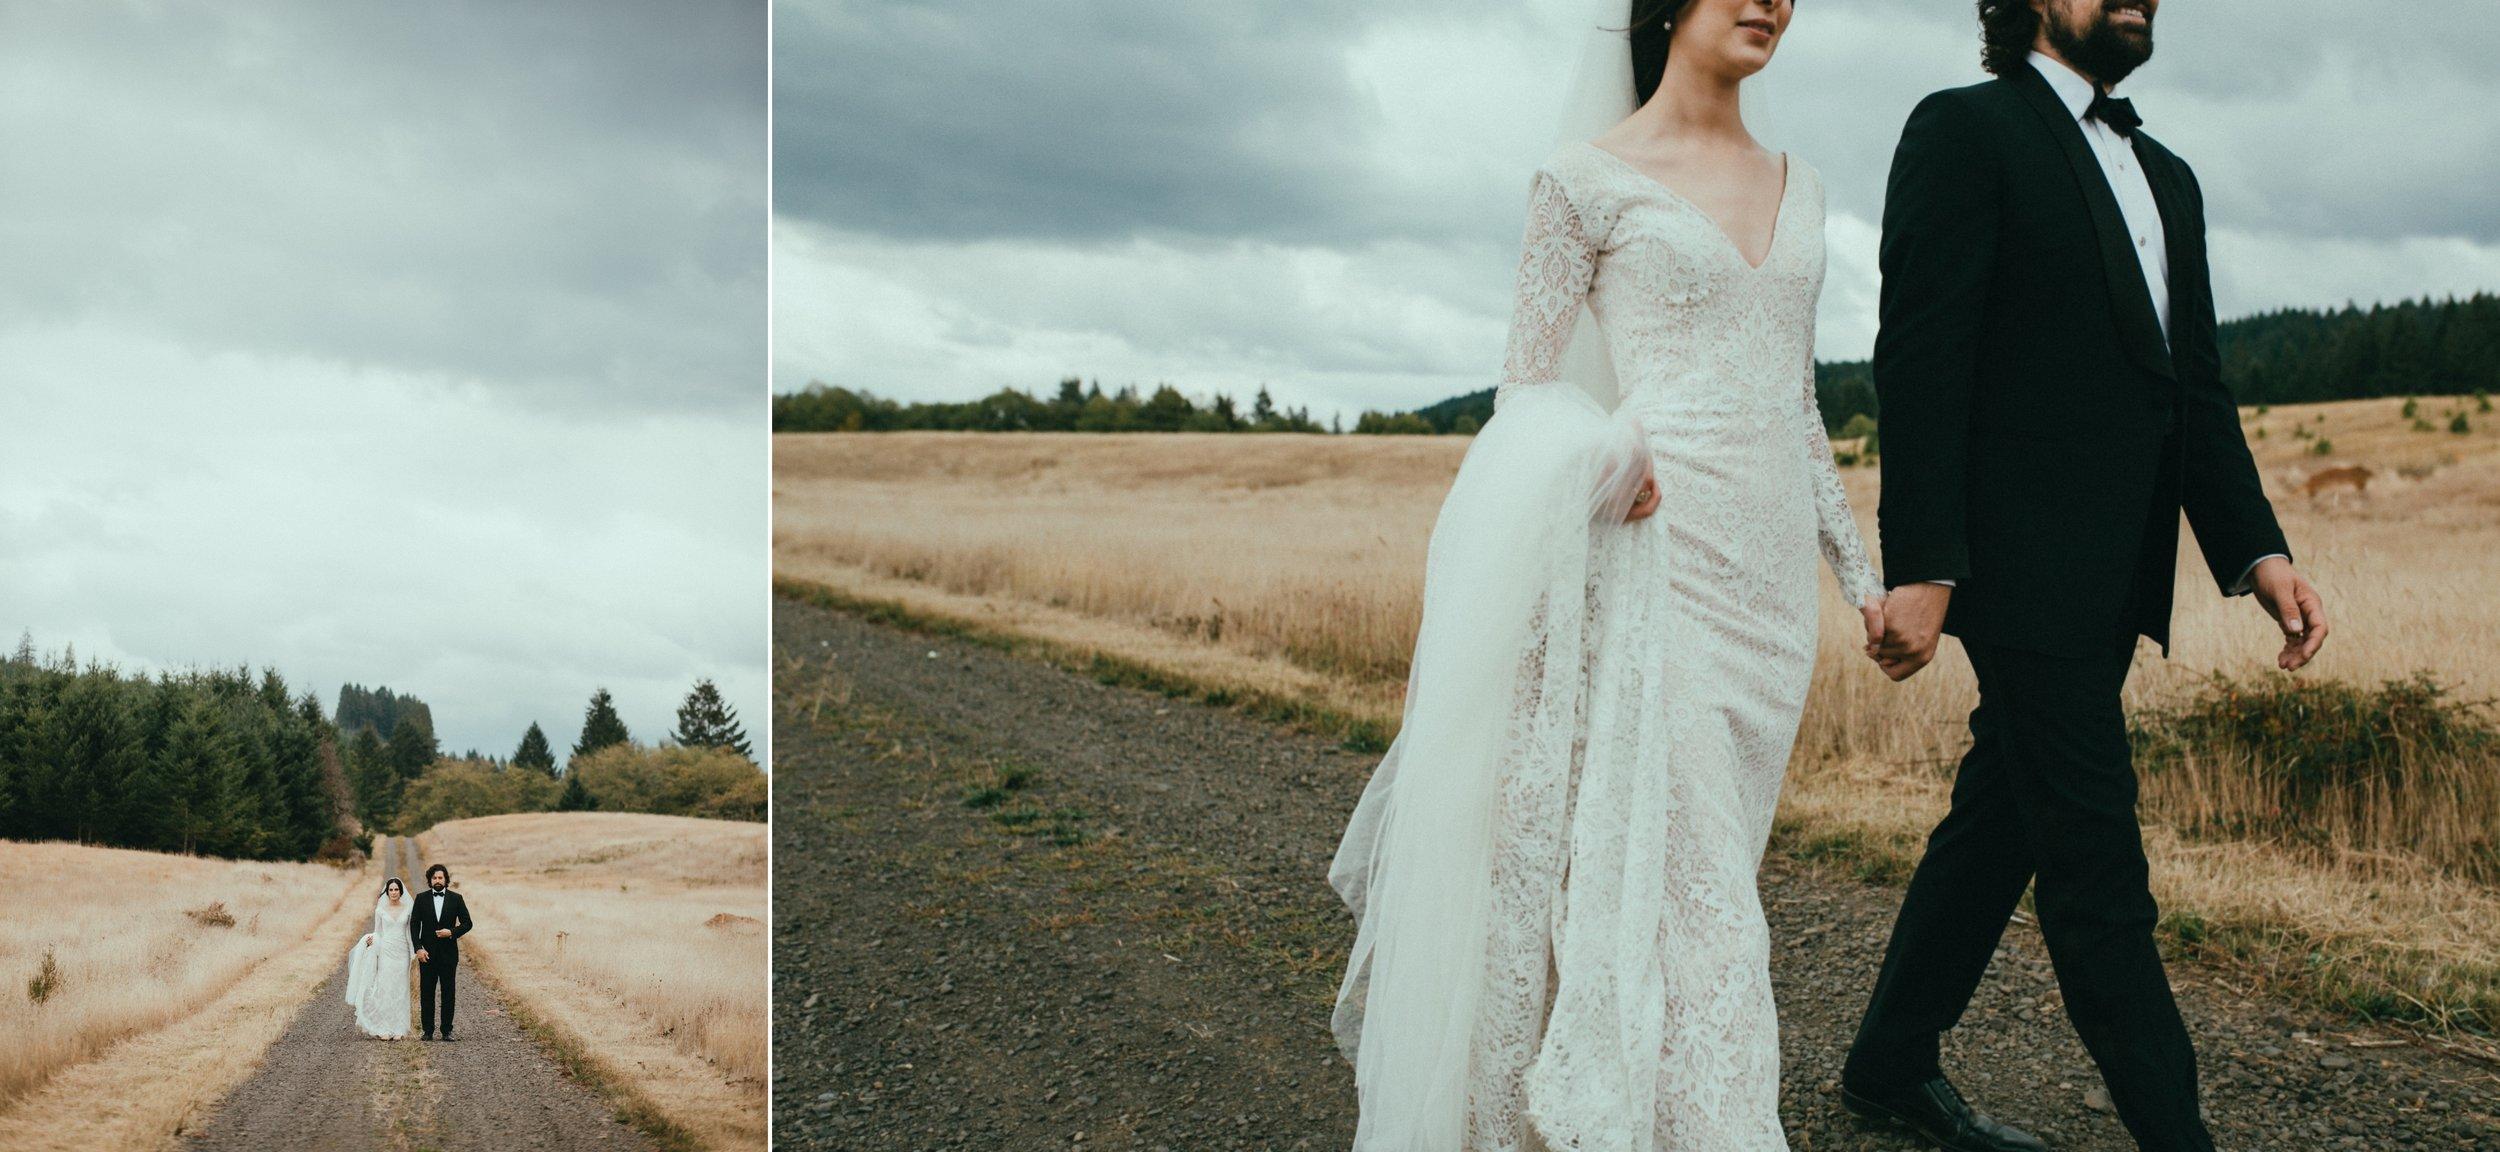 destination-wedding-photographer-italy67.jpg